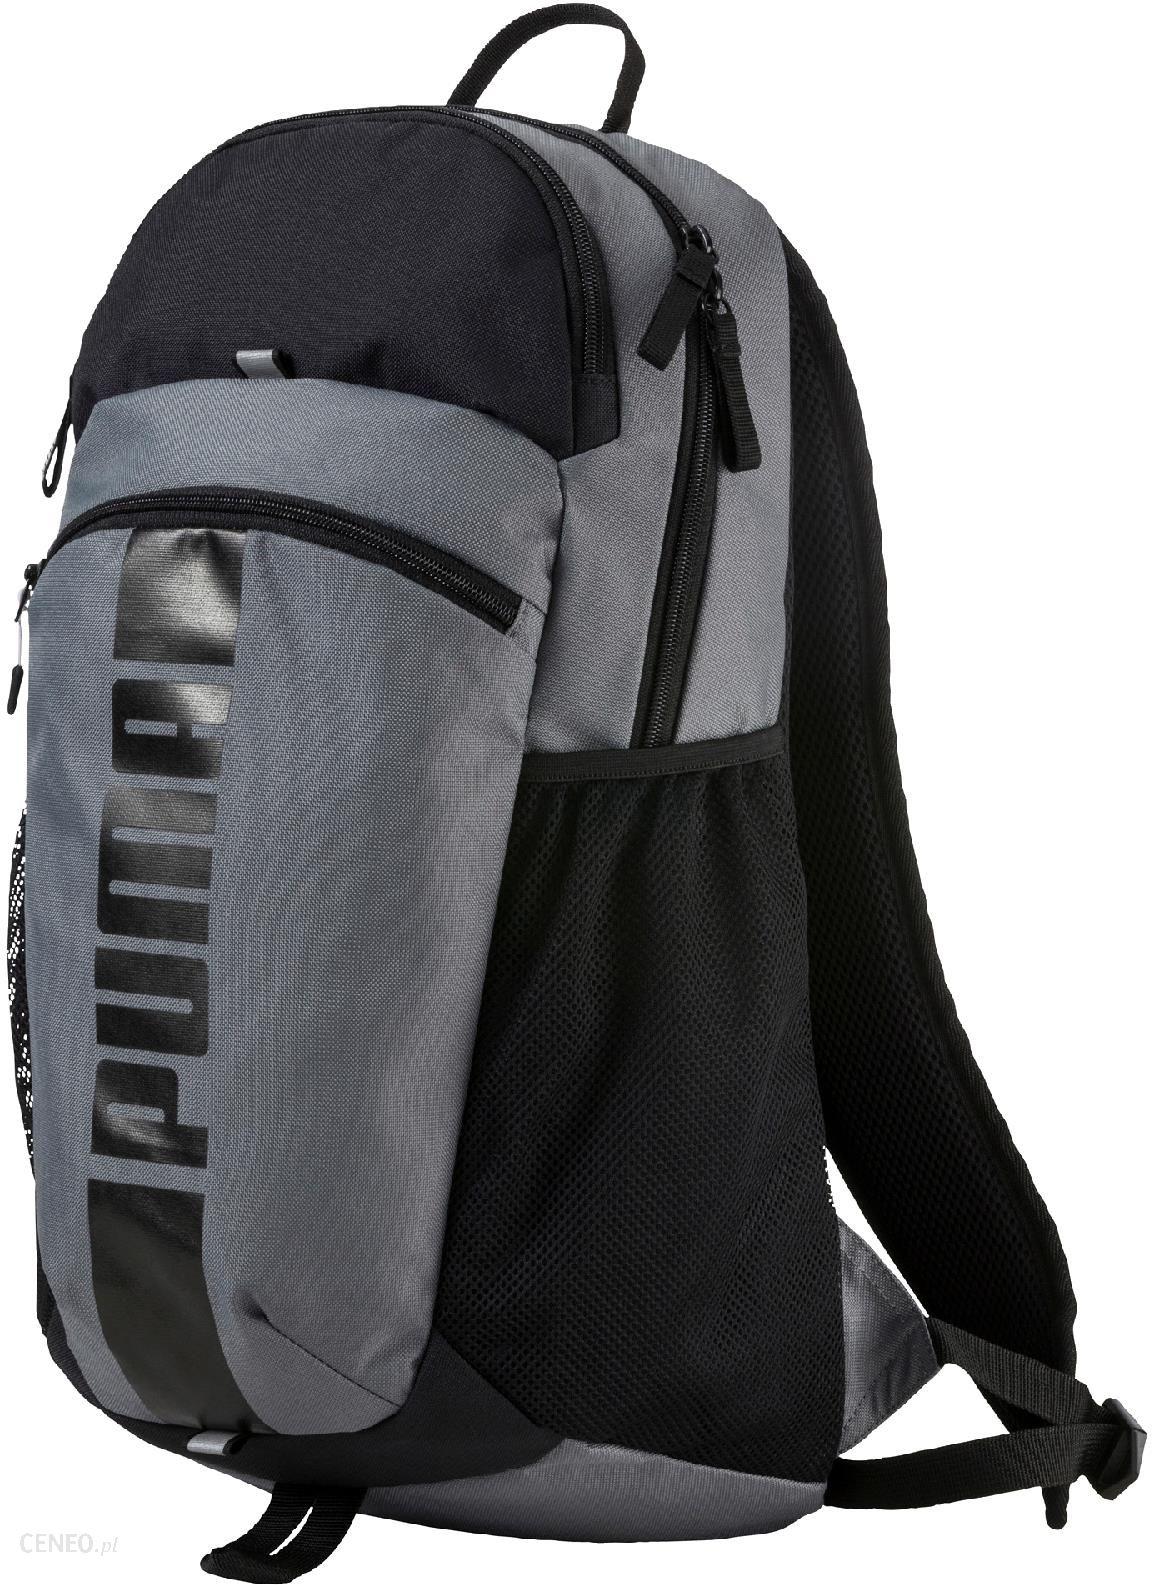 f0736764d507 Plecak Puma Deck Backpack Ii Black Quiet S - Ceny i opinie - Ceneo.pl